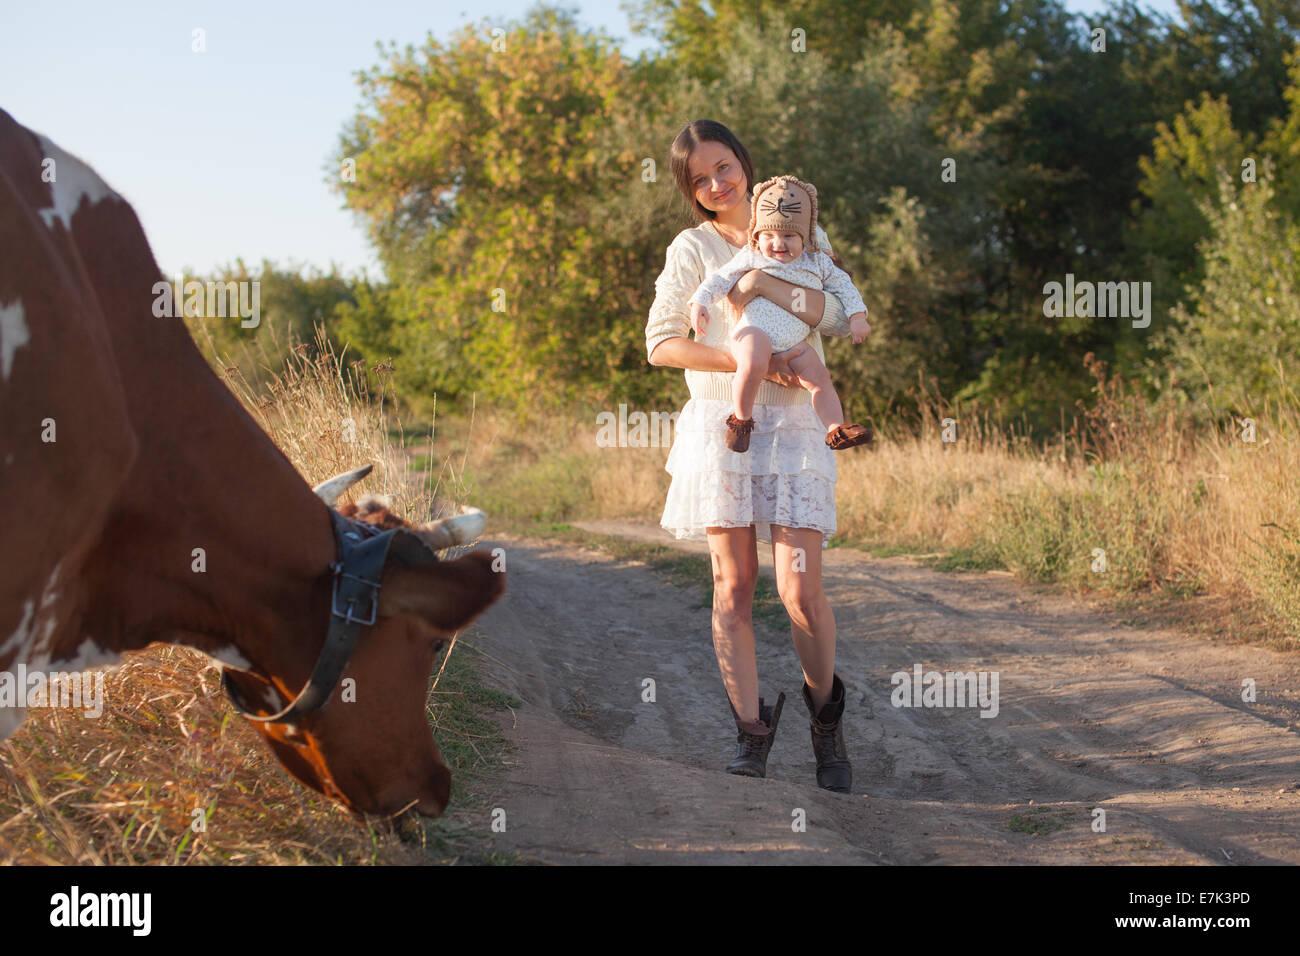 Bebé cumple una vaca Imagen De Stock